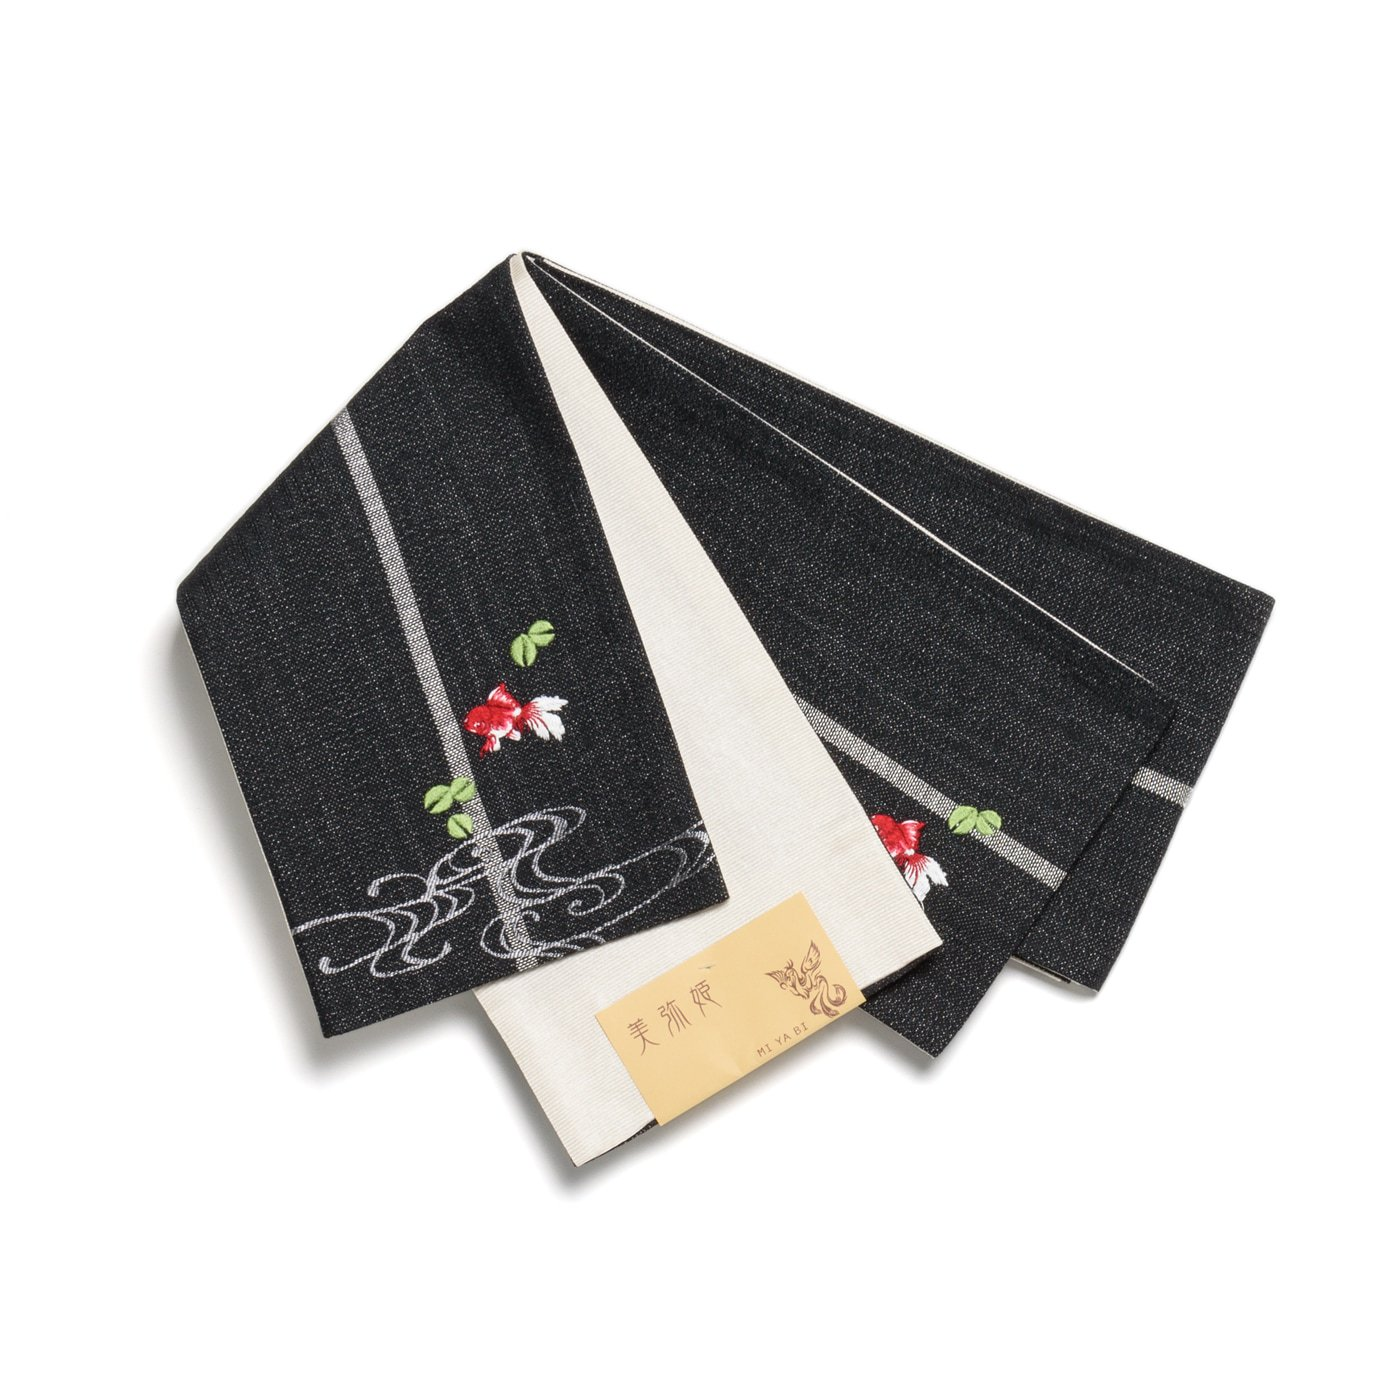 「半幅帯 黒色地×金魚」の商品画像